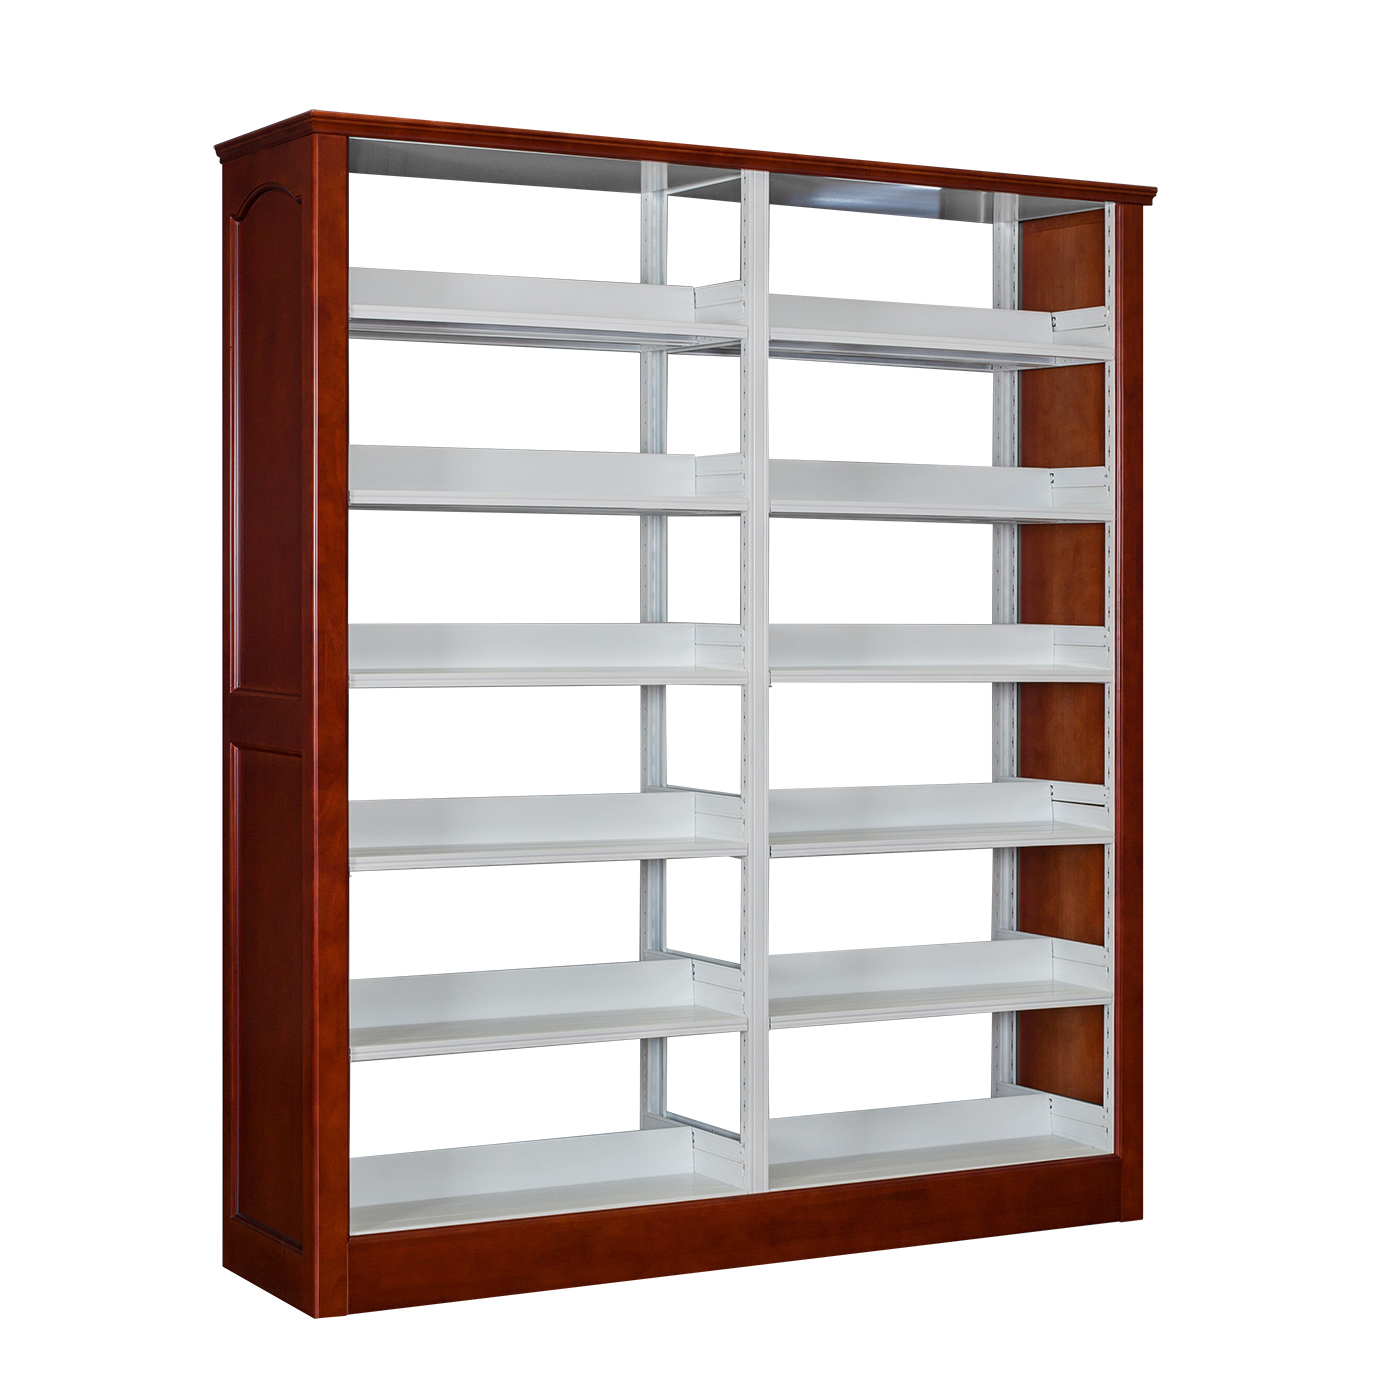 GF-016 橡木护板双柱双面书架